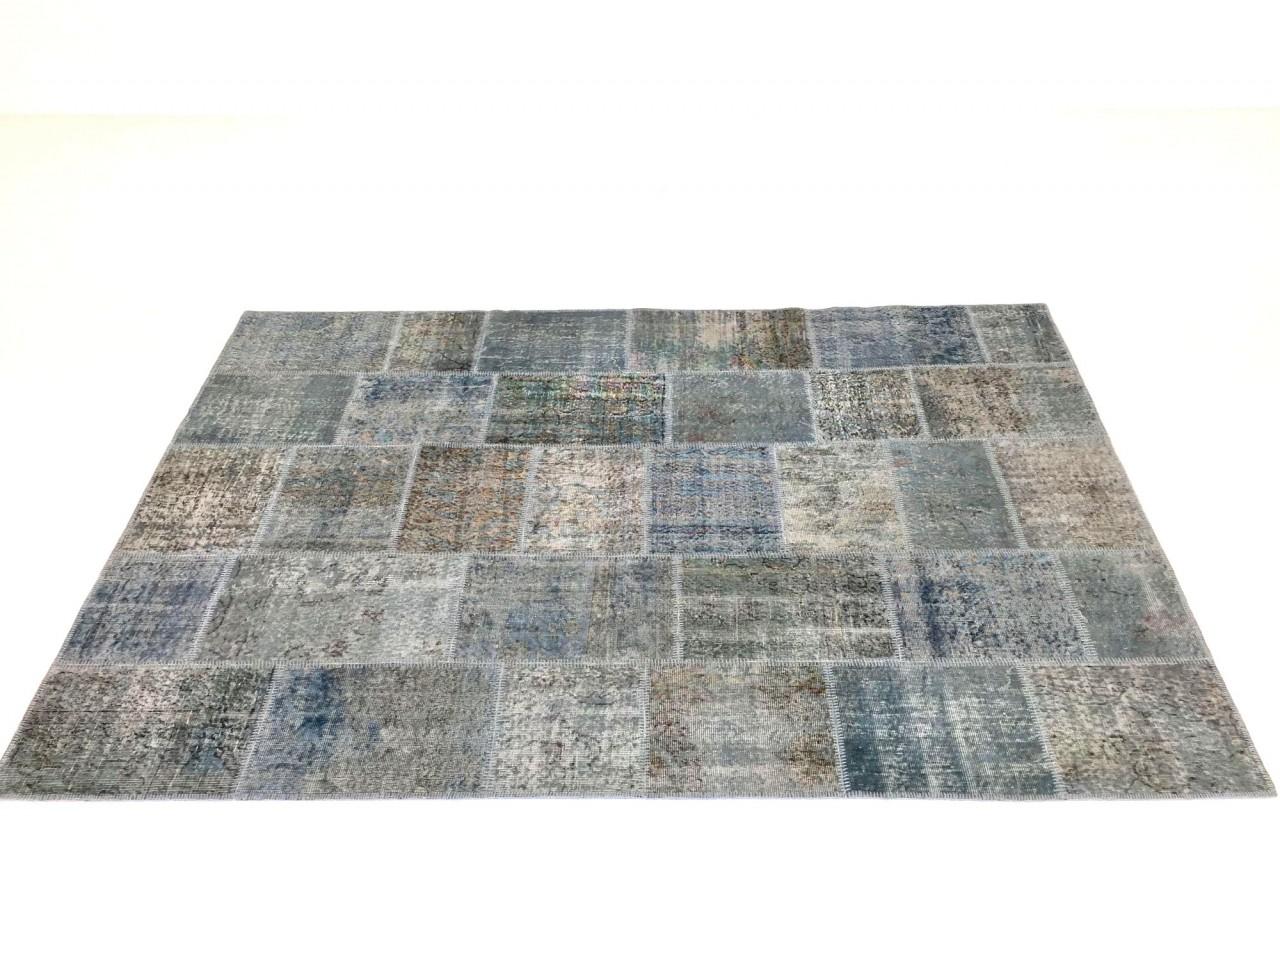 SARTORI KARMA PATCH Vintage Teppich in blaugrau Farbtönen